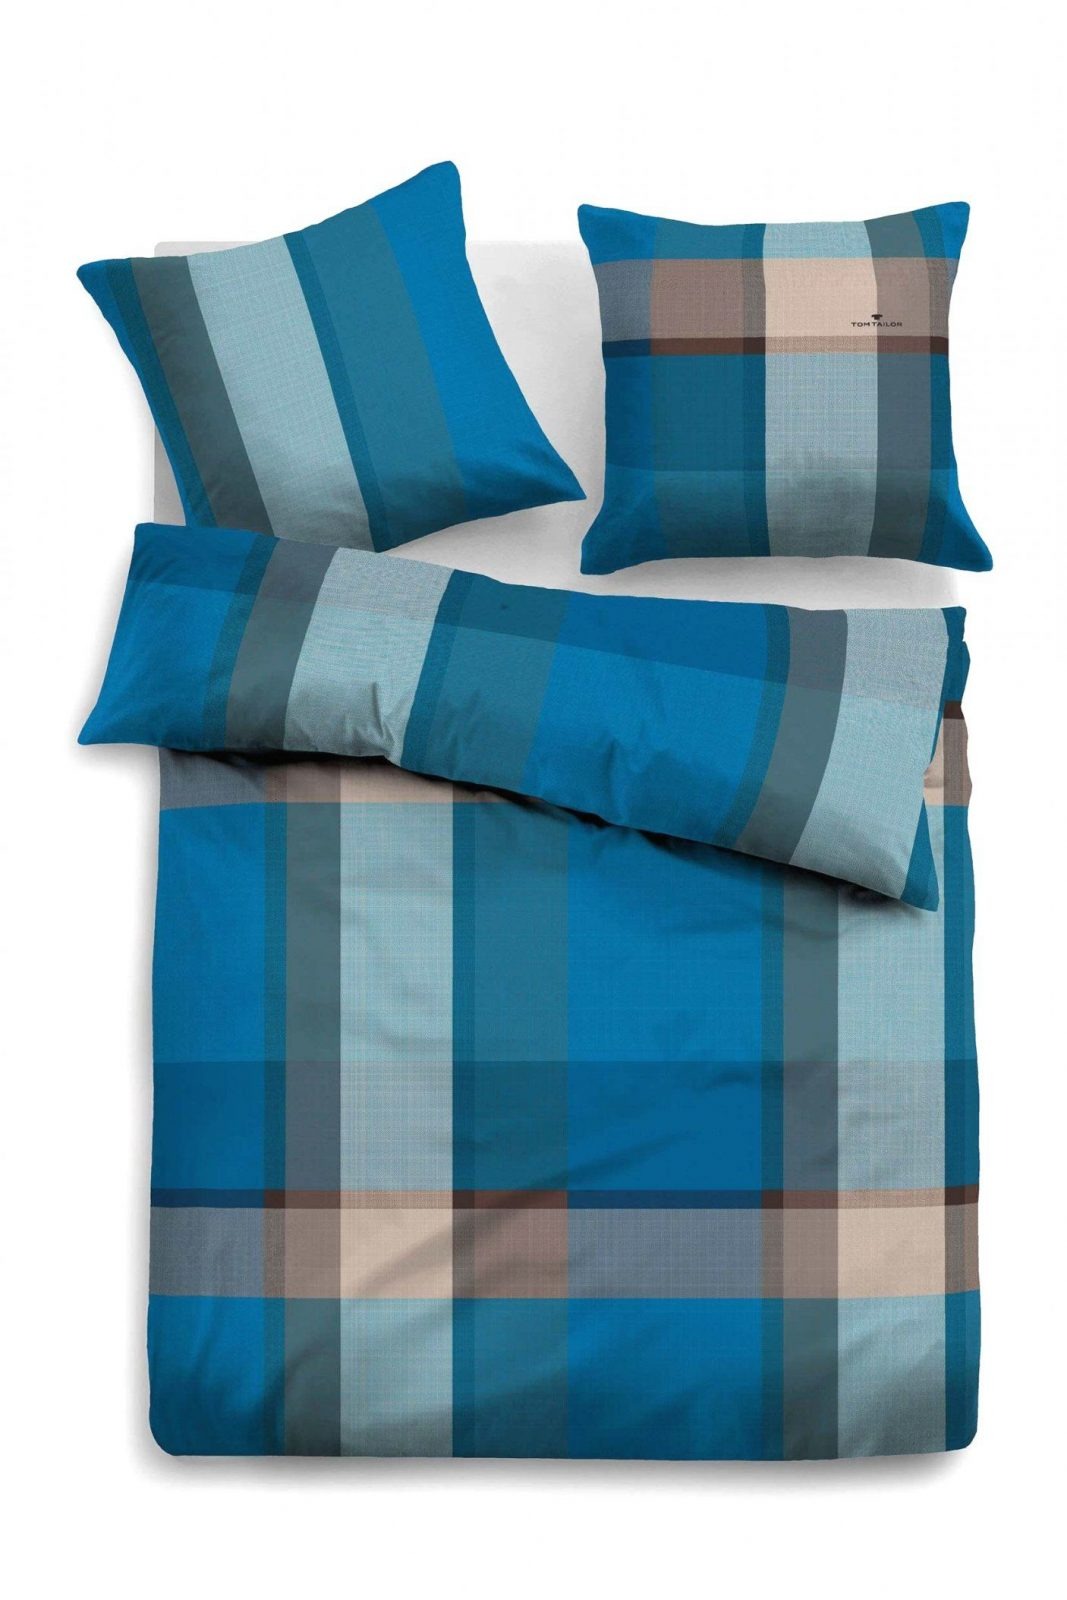 Unglaubliche Inspiration Tom Tailor Bettwäsche 135×200 Und Geniale von Tom Tailor Bettwäsche 135X200 Photo